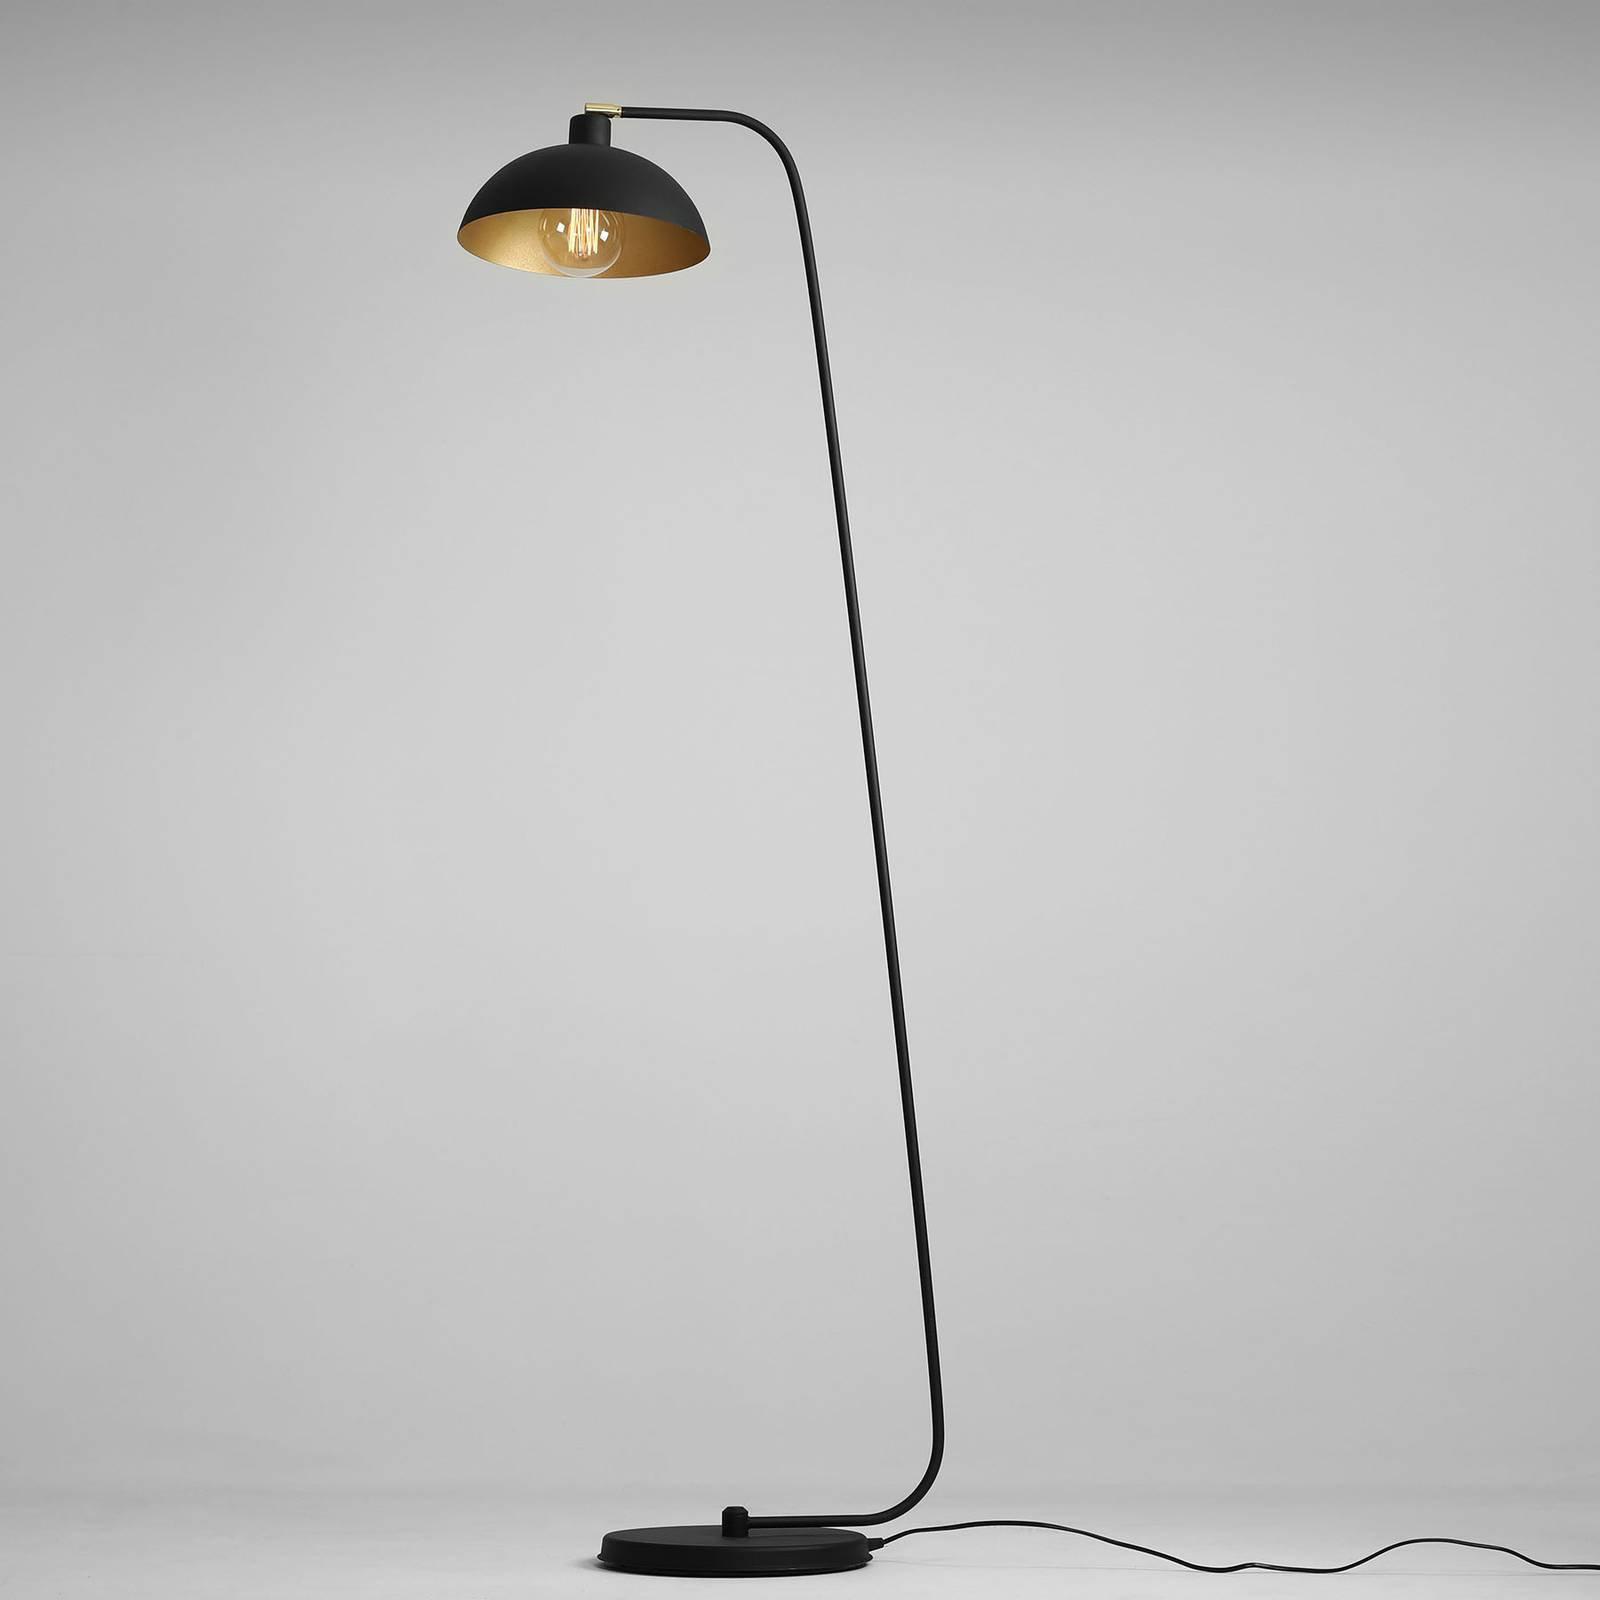 1036 gulvlampe, 1 lyskilde, svart-gull